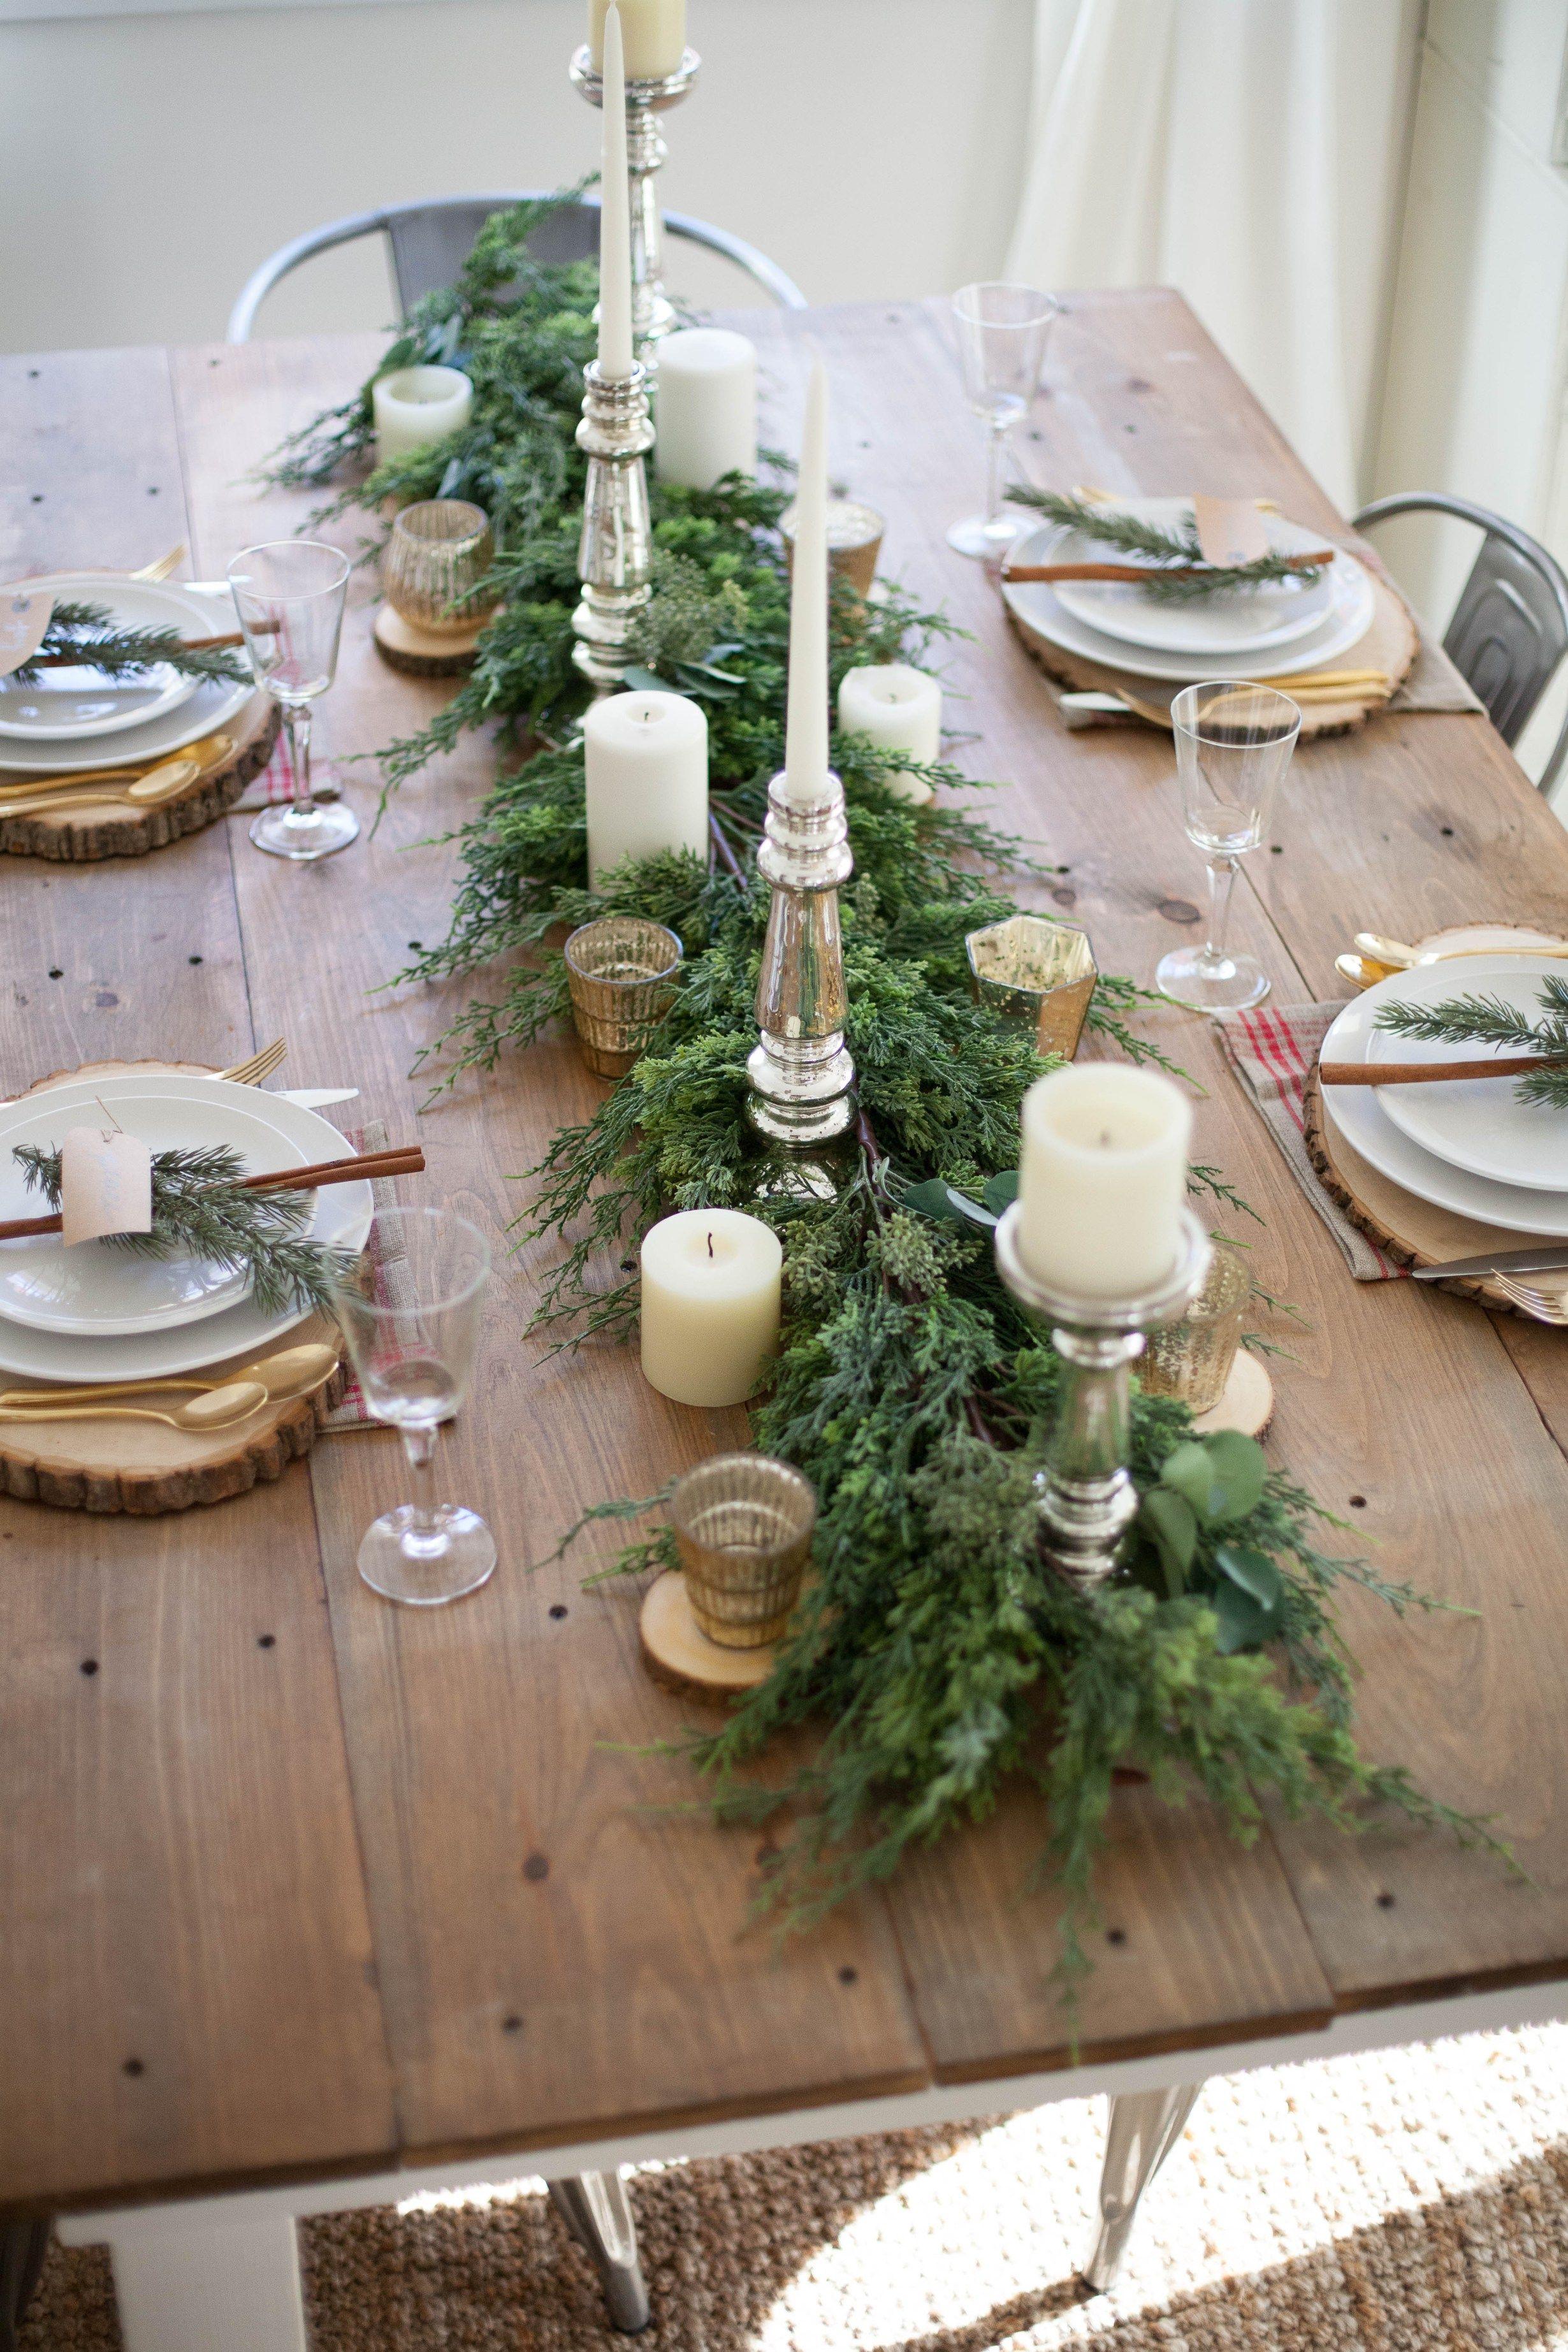 Home Farmhouse Christmas Tablescape C H R I S T M A S